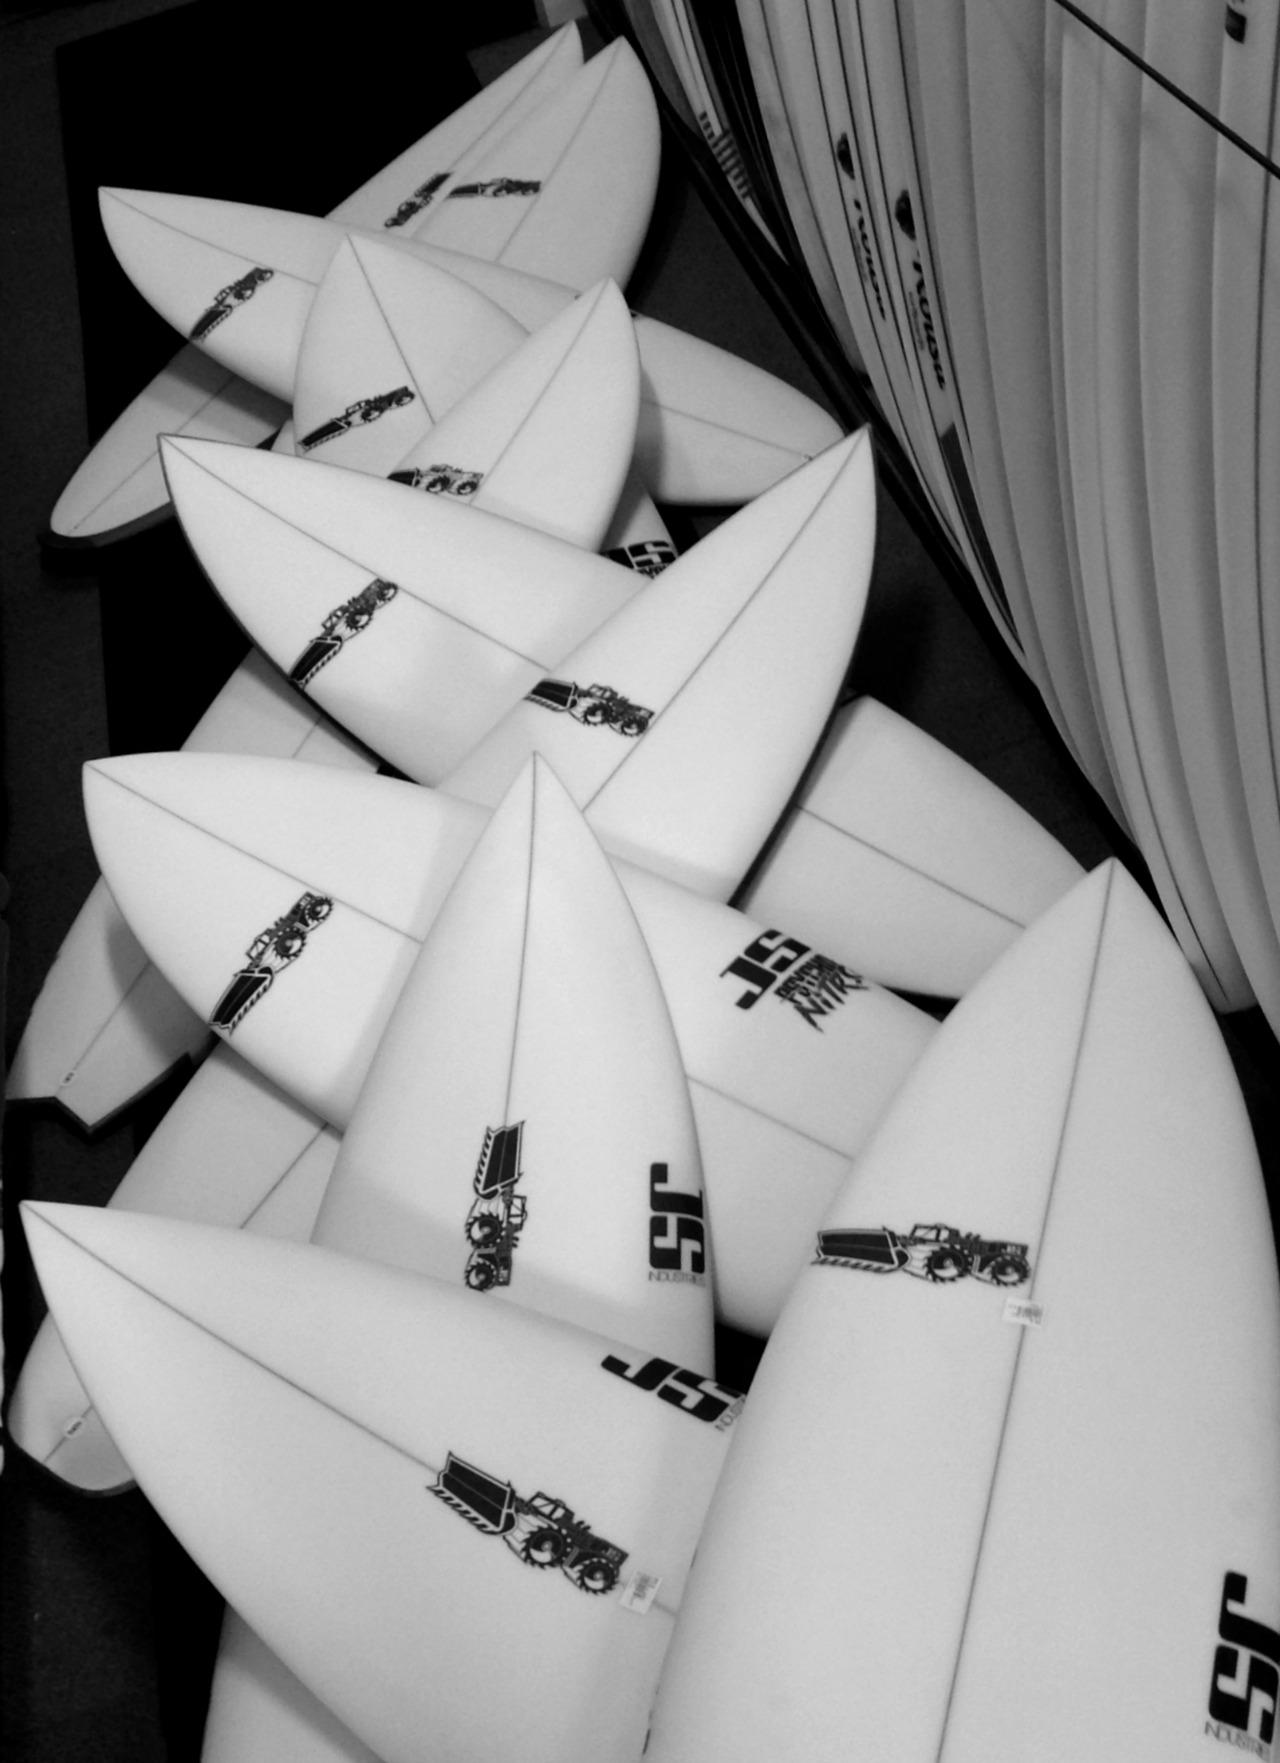 Big top up of JS Industries Surfboard models just arrived